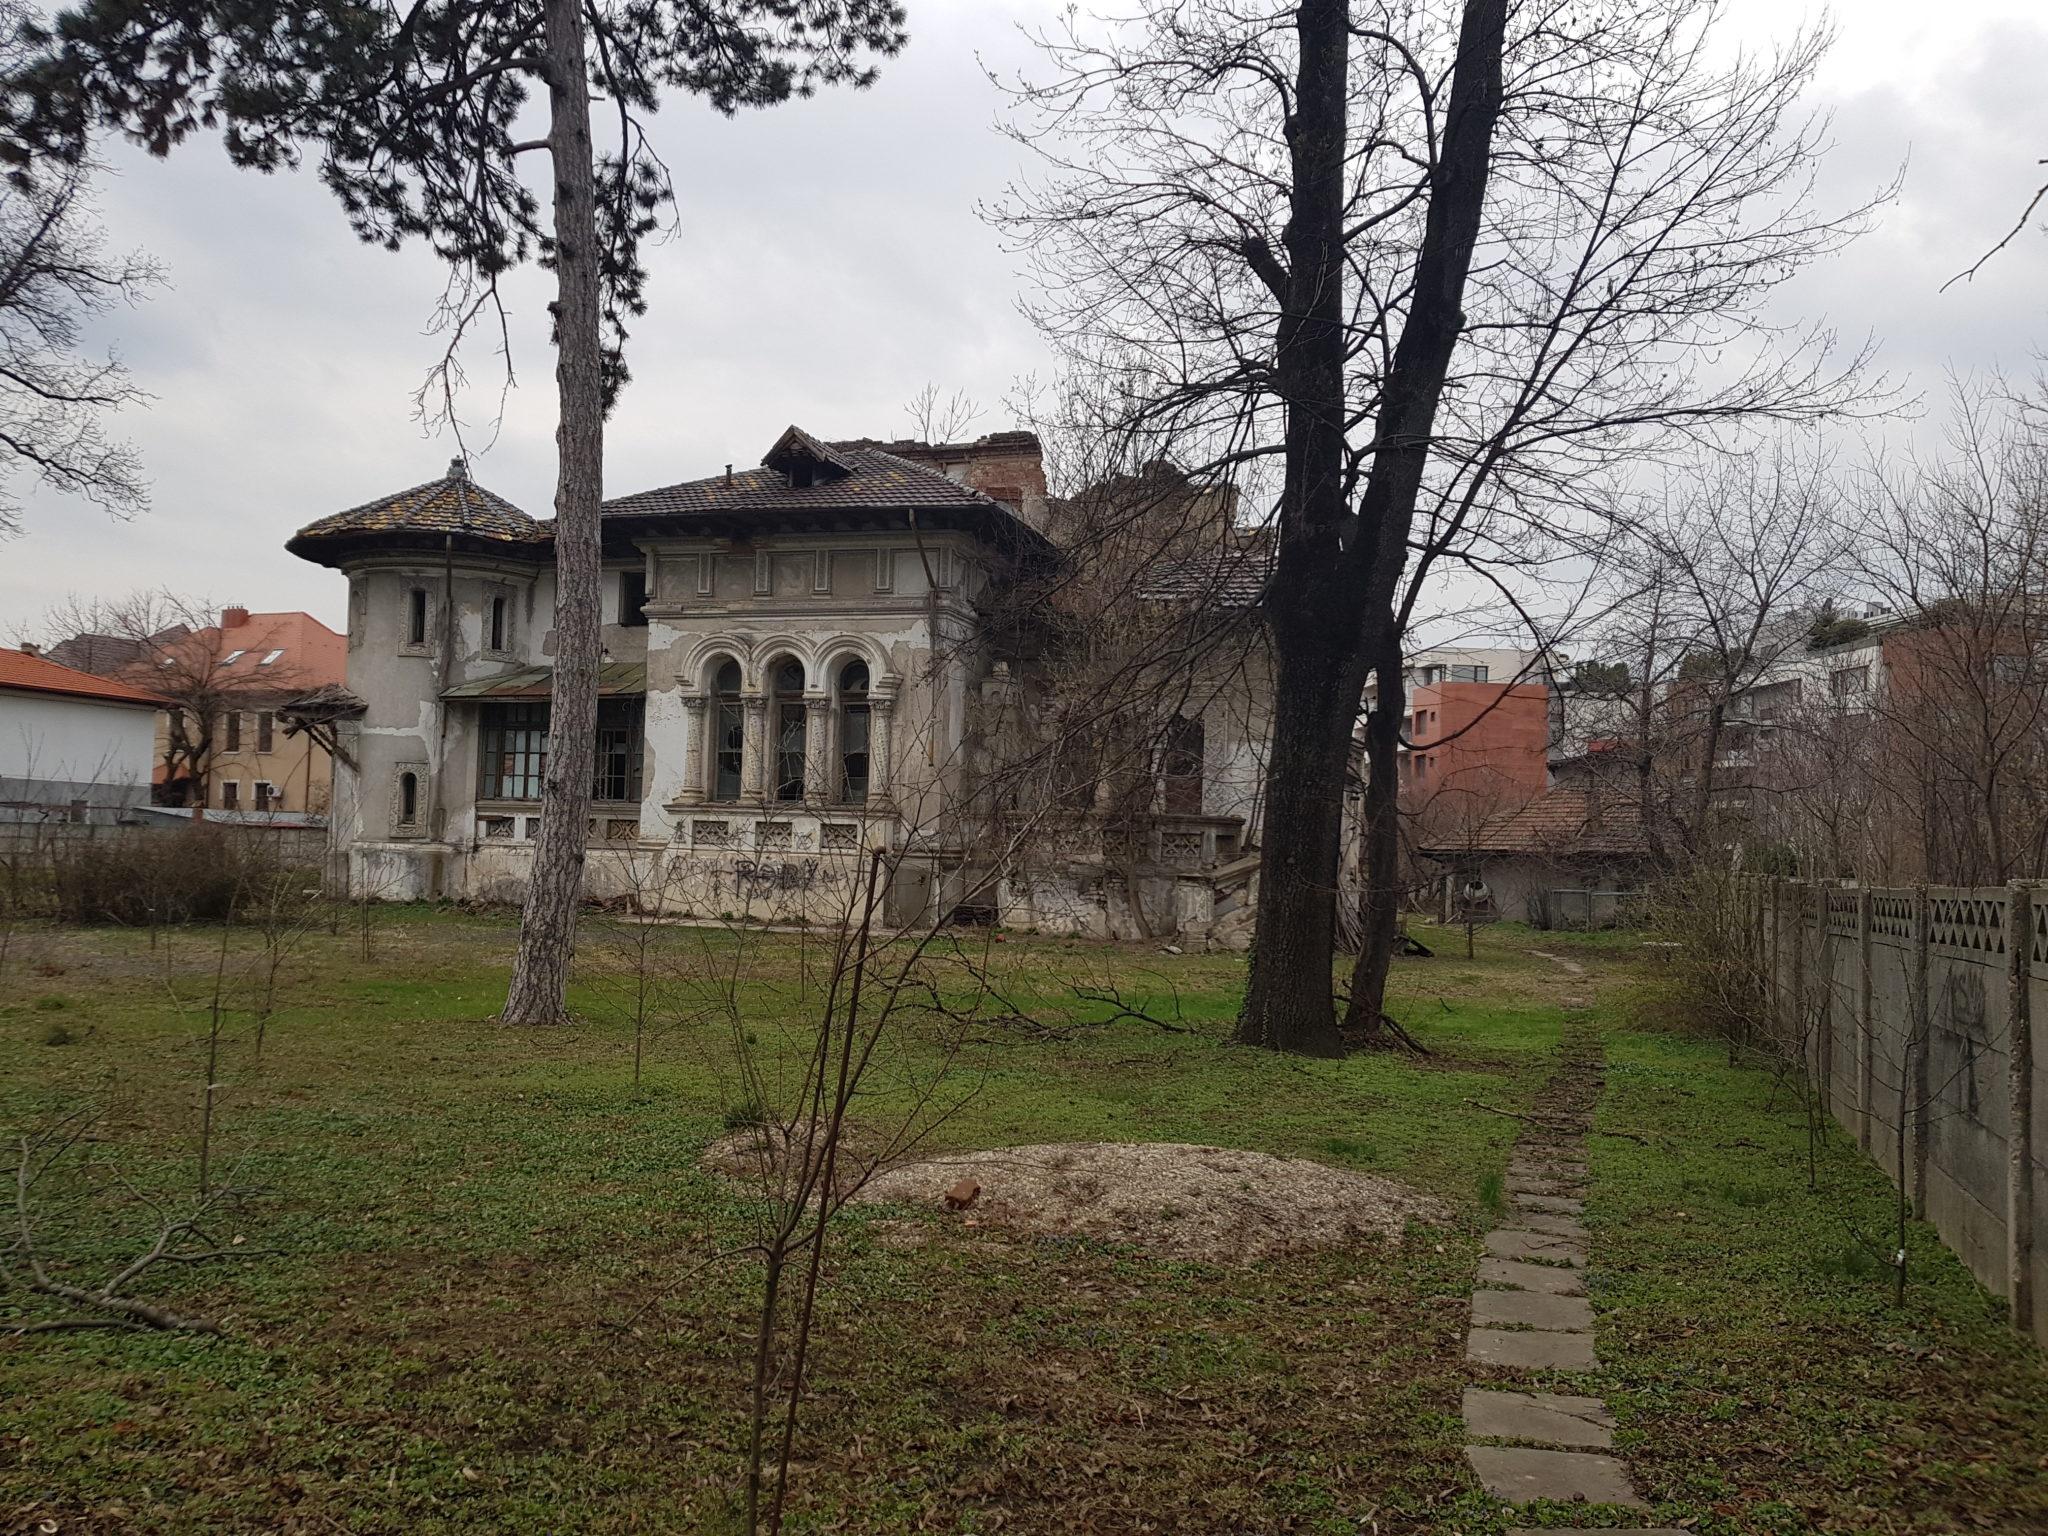 Glibertarians | A tour of Pie's Place: Bucharest, the